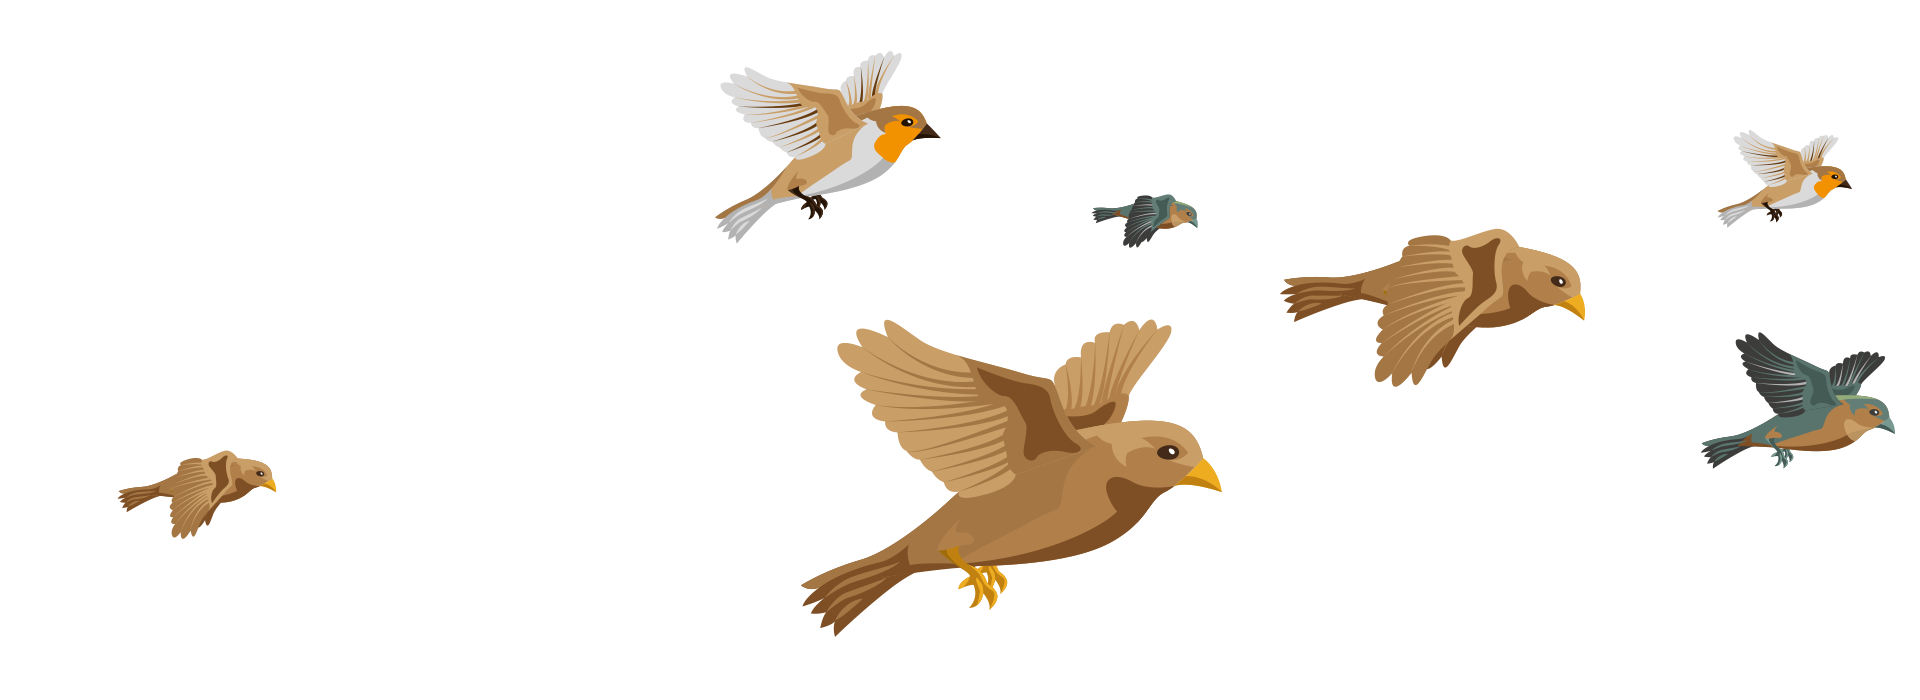 https://www.sanjoaninas.pt/wp-content/uploads/2020/01/birds.png